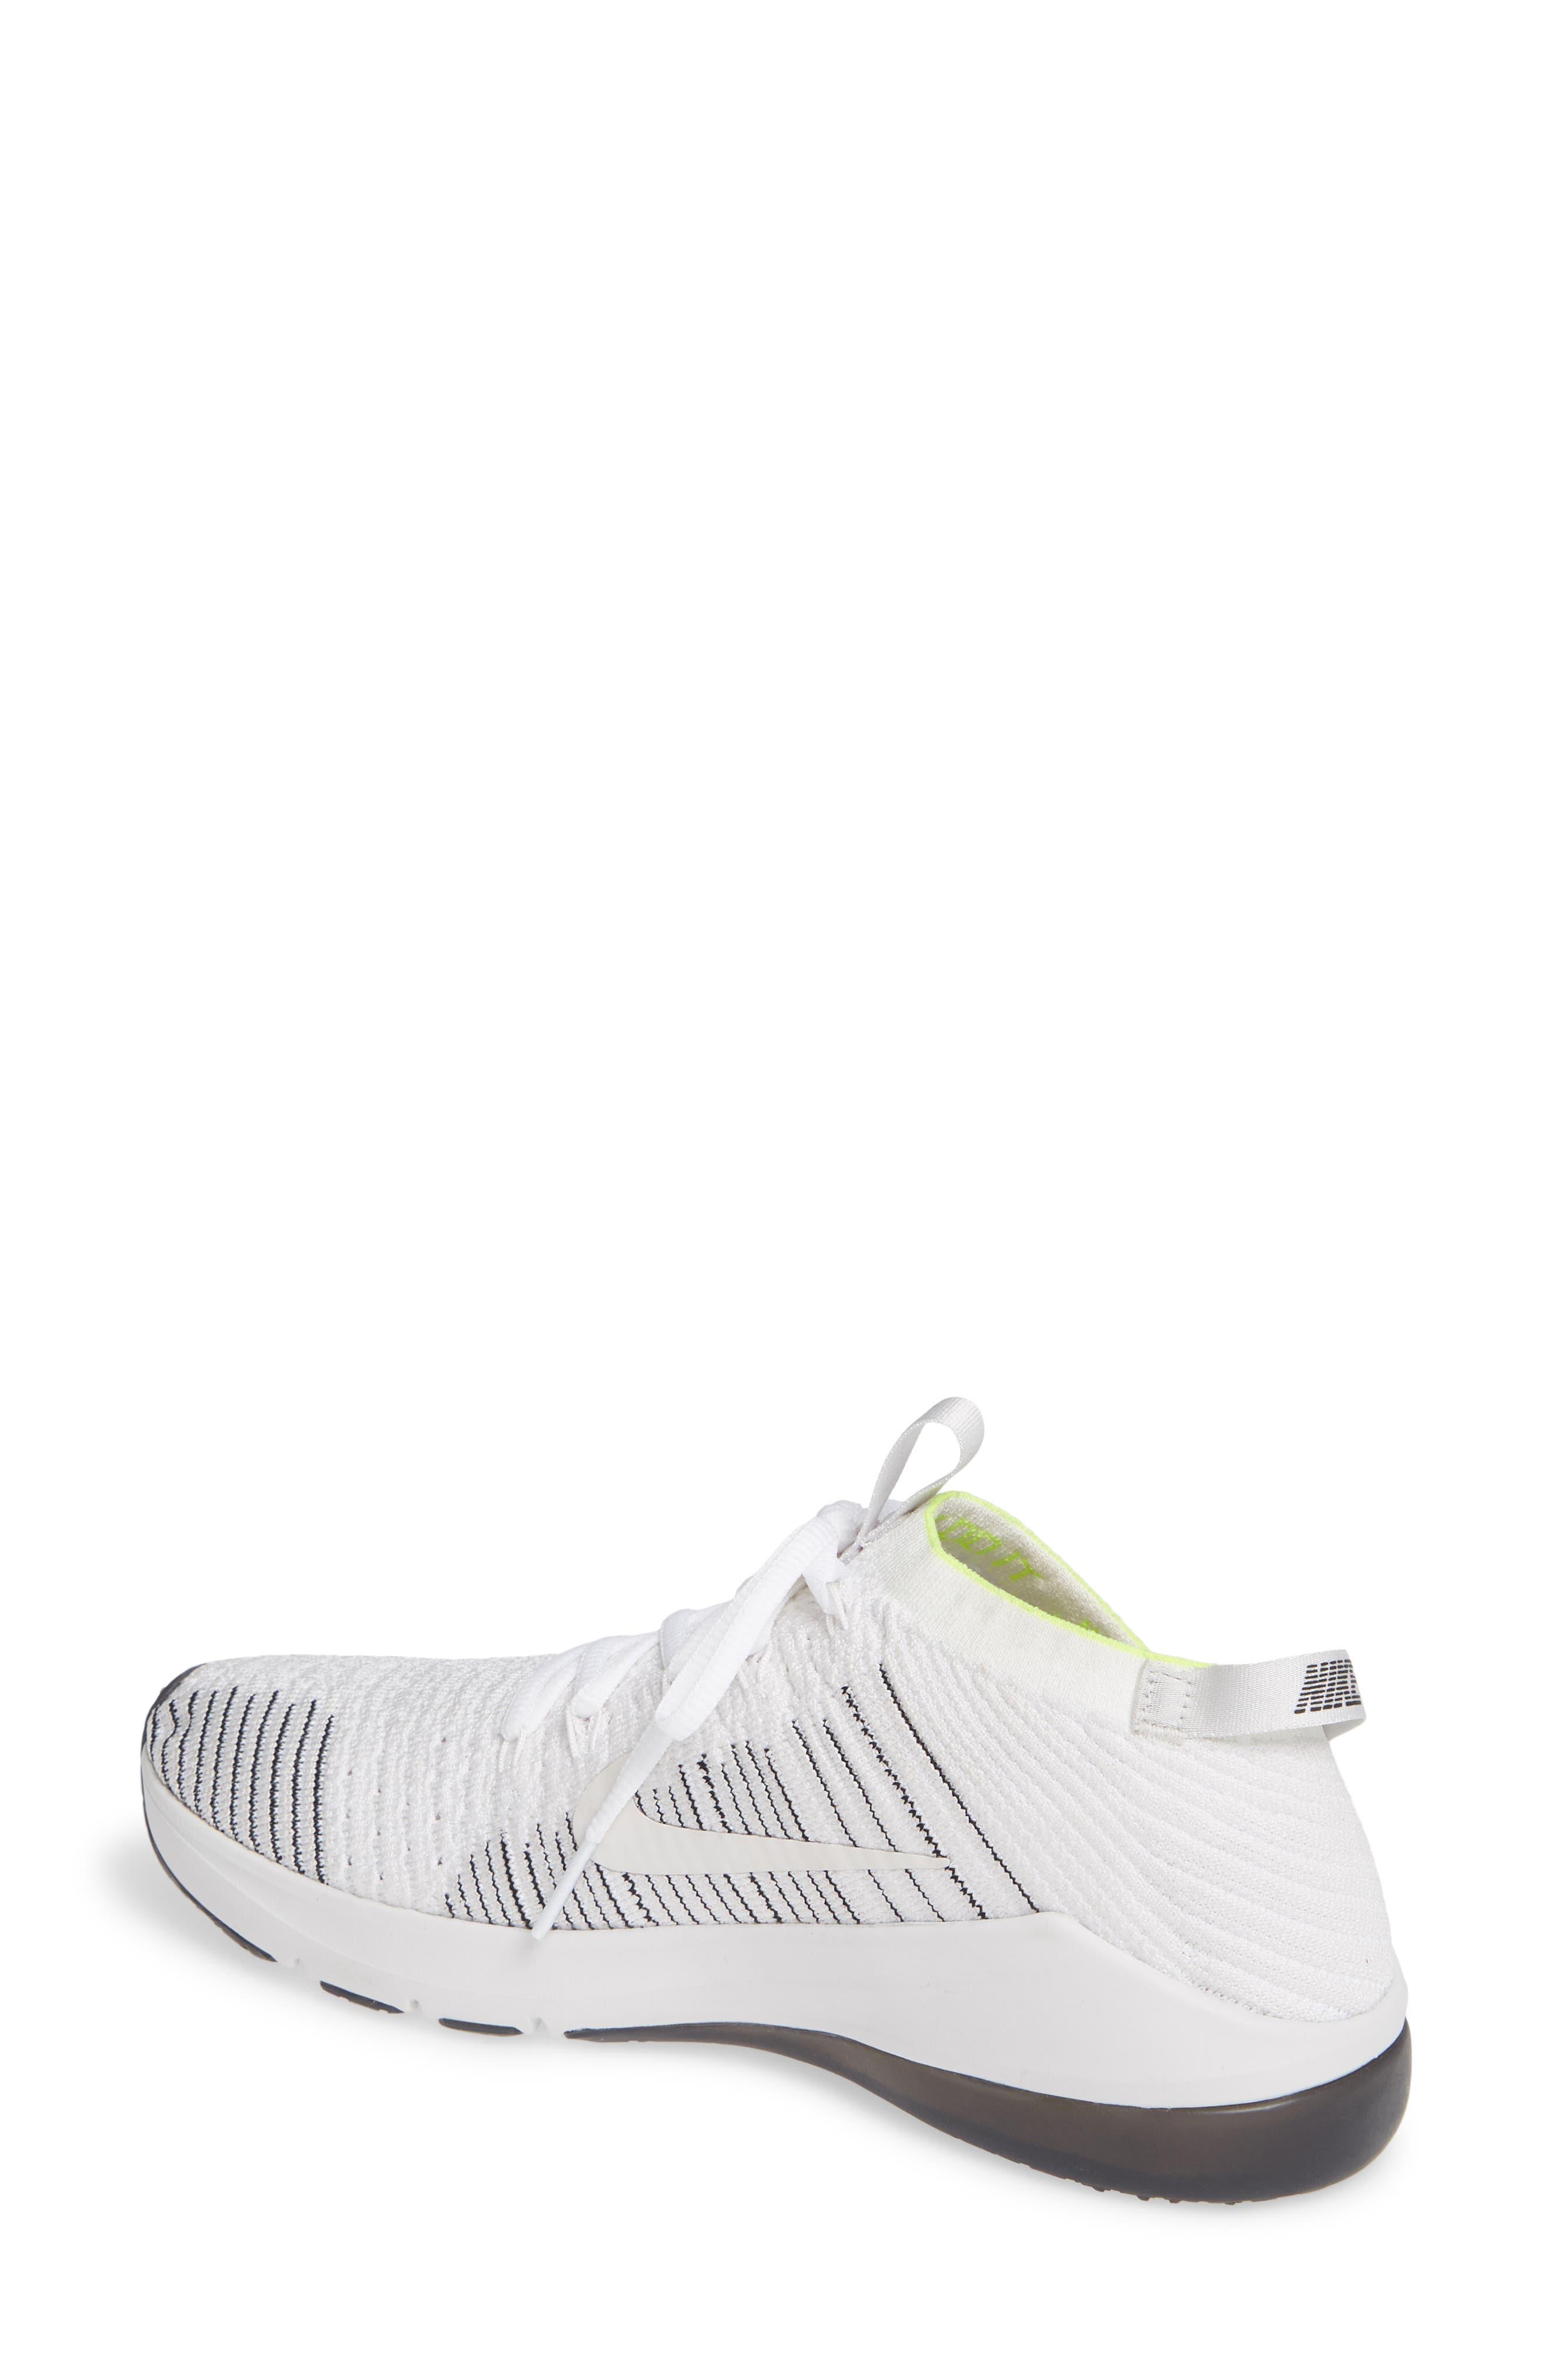 NIKE, Air Zoom Fearless Flyknit 2 Training Sneaker, Alternate thumbnail 2, color, WHITE/ PLATINUM TINT/ BLACK